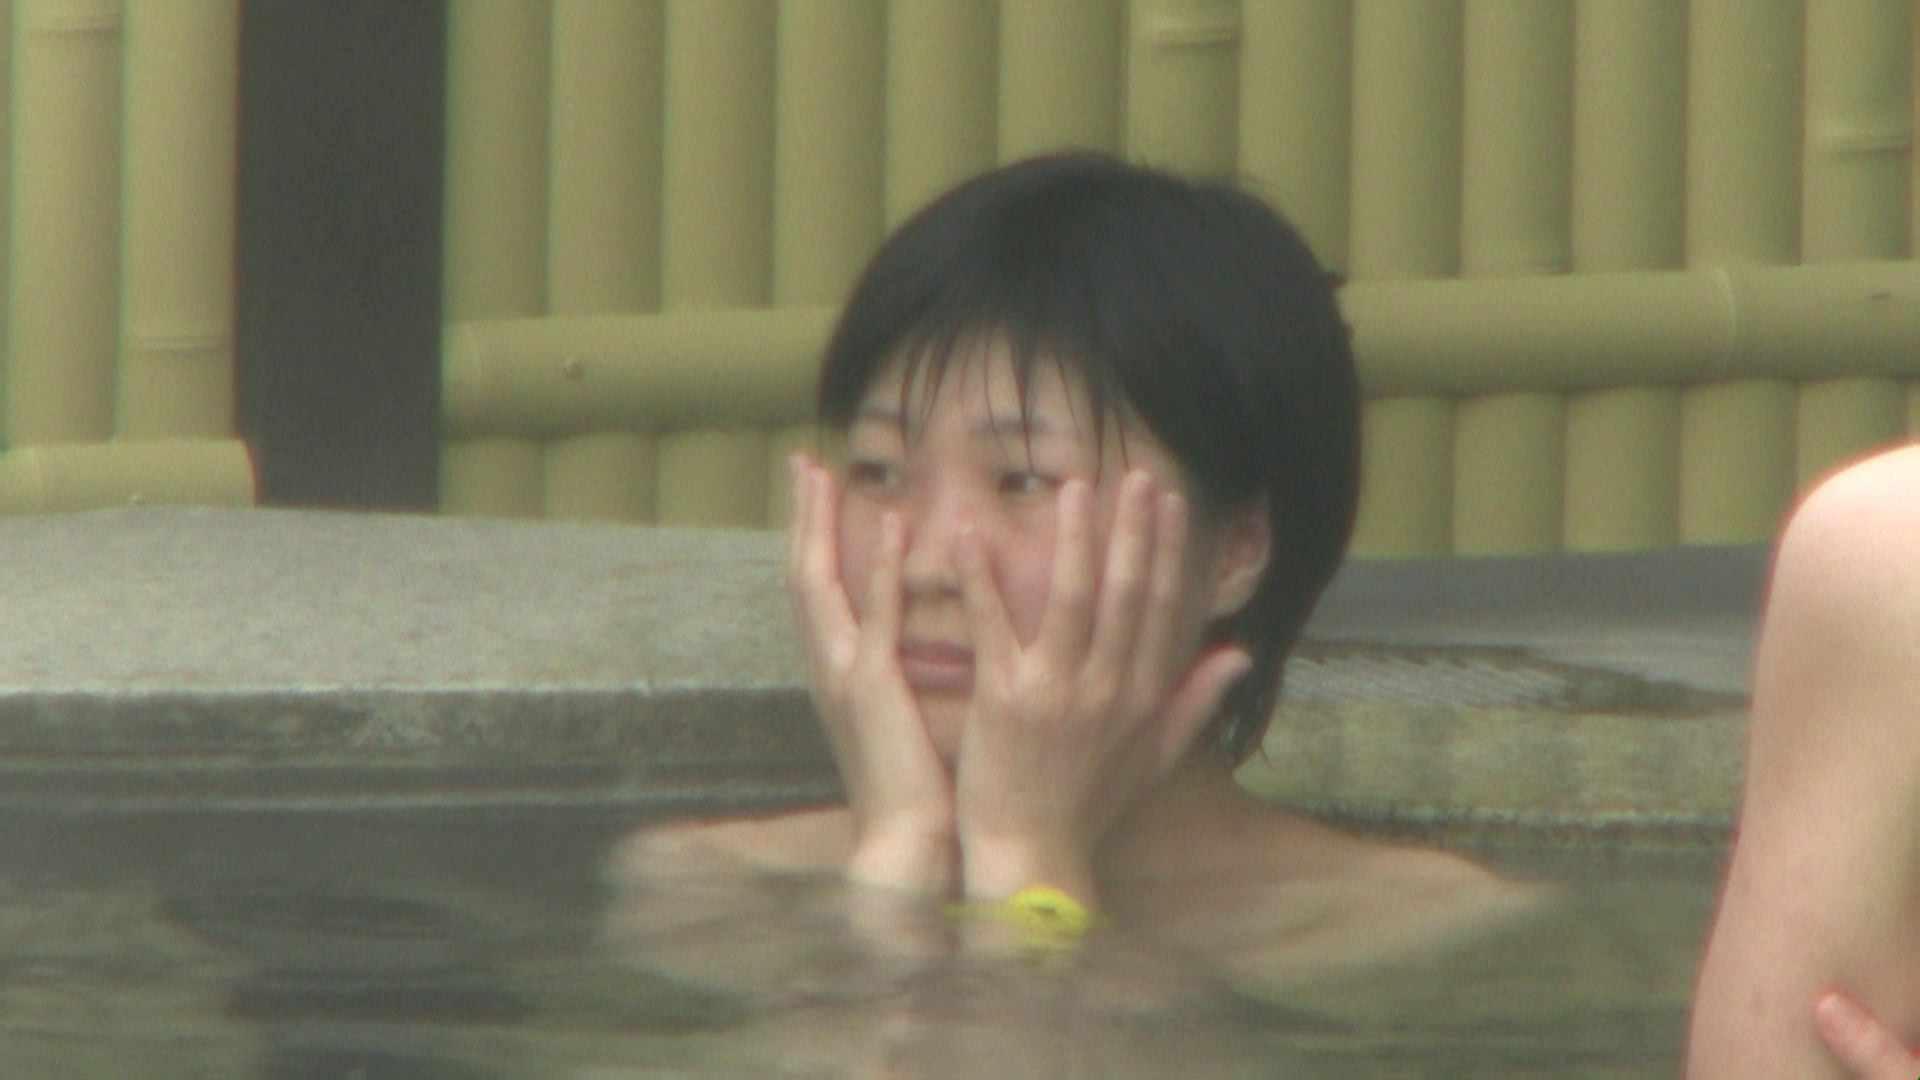 Aquaな露天風呂Vol.74【VIP限定】 OLセックス | 露天  68画像 52